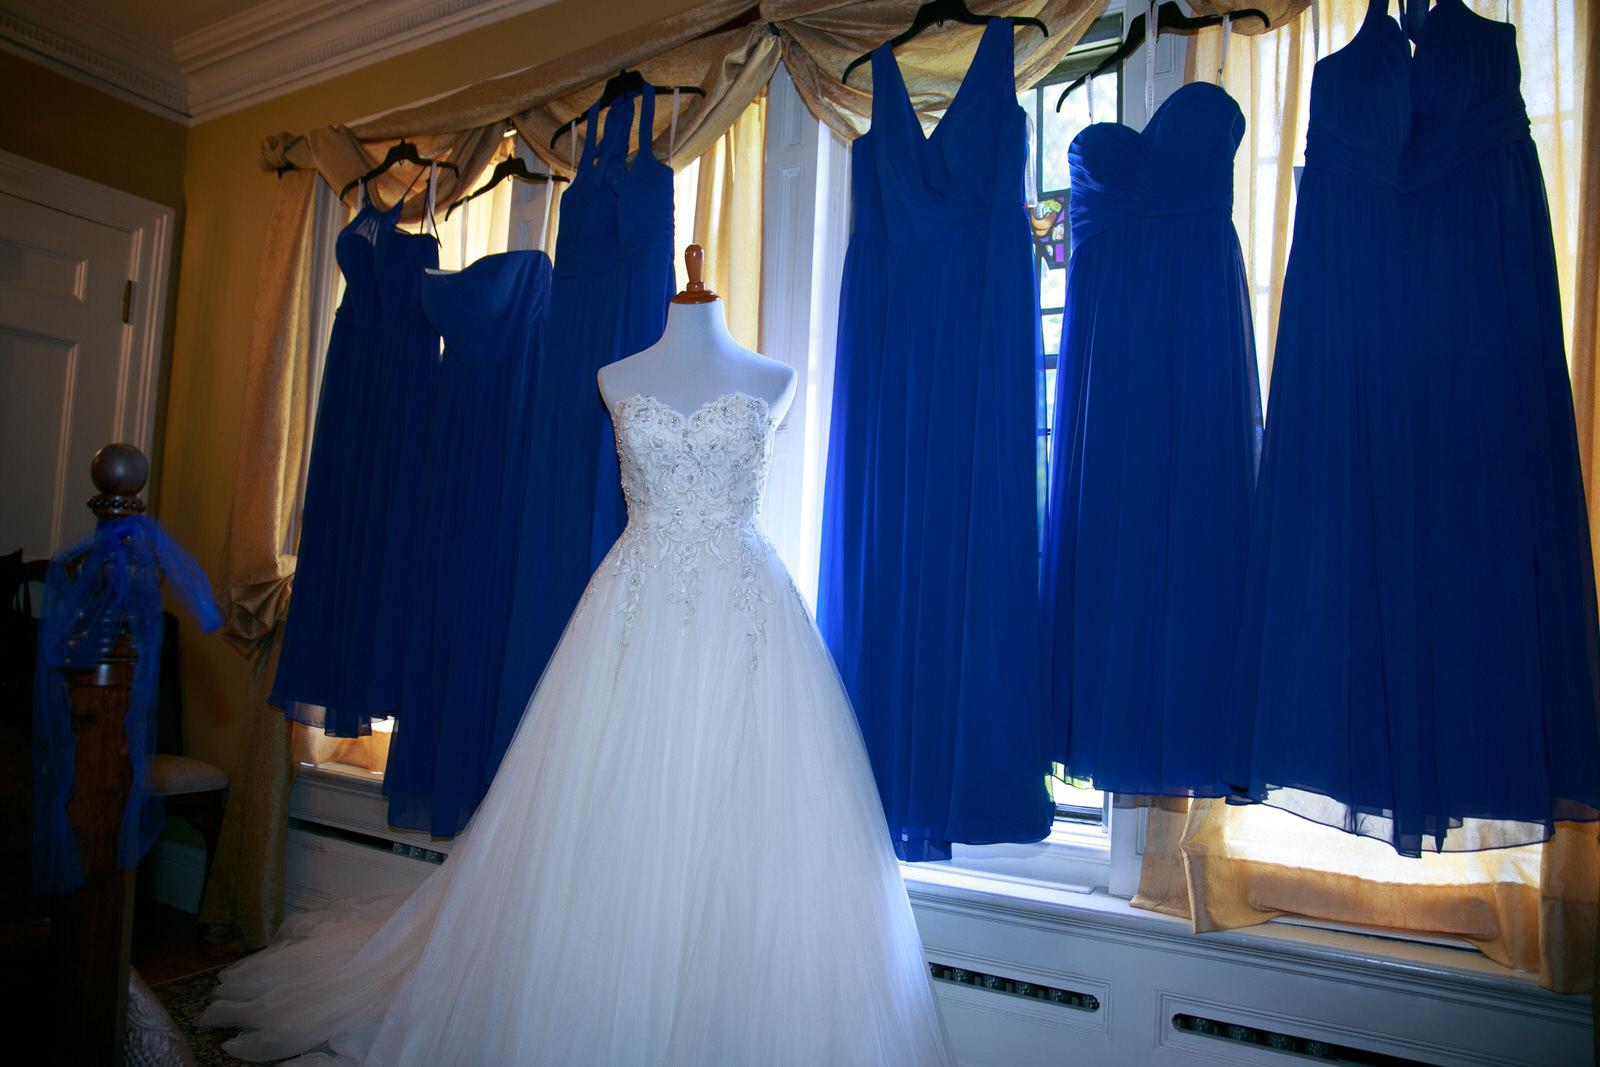 Thornewood Castle Wedding Kate and Daniel Wedding Web02.jpg